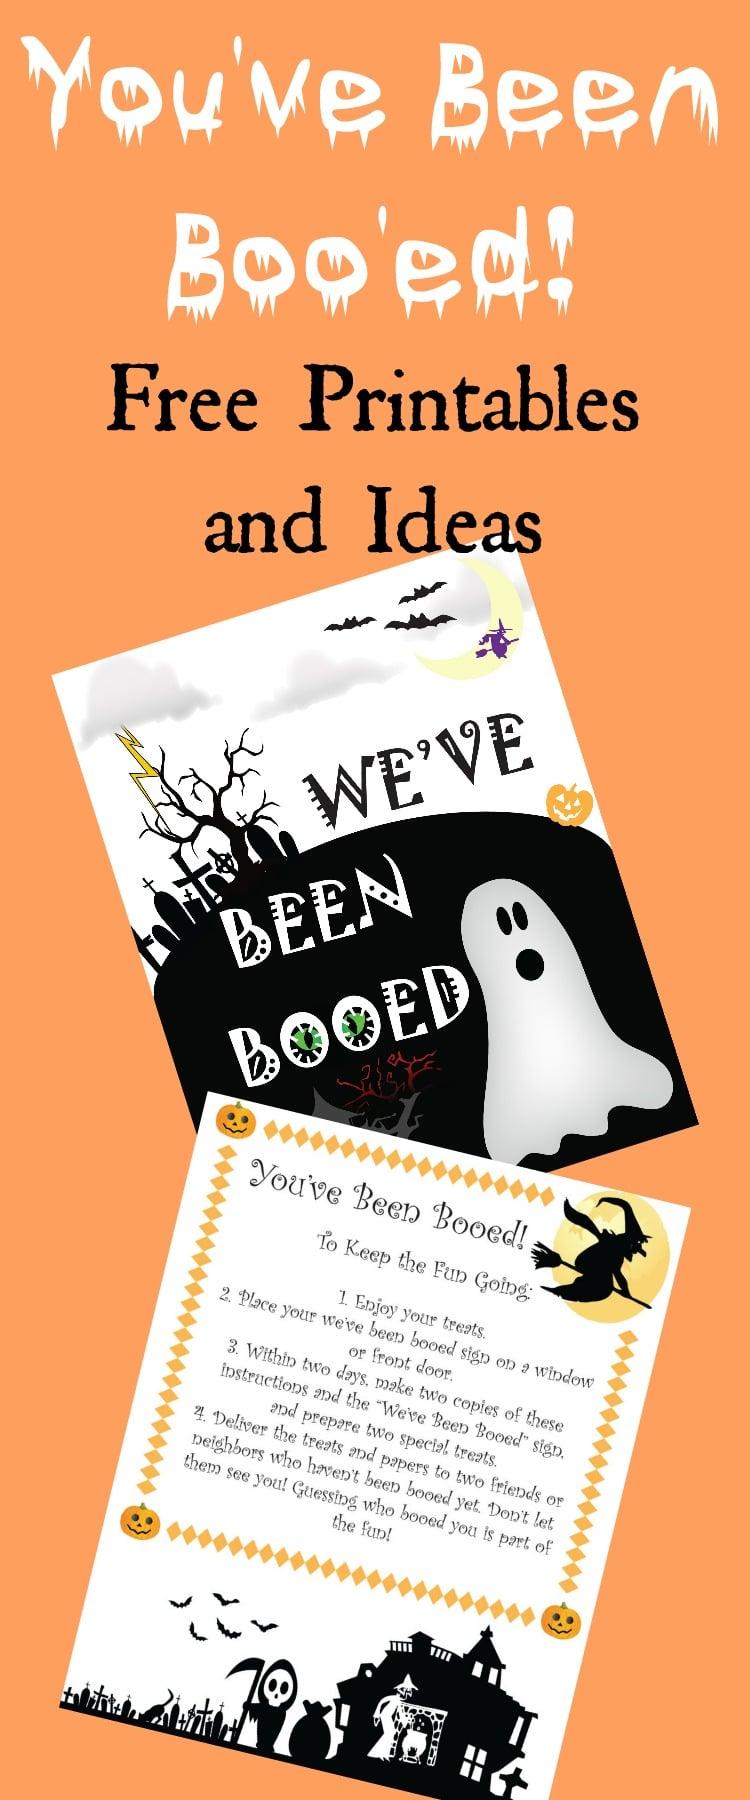 You've Been Boo'ed Printable / You've Been Boo'ed Ideas / You've Been Boo'ed Free Printable / Halloween Ideas